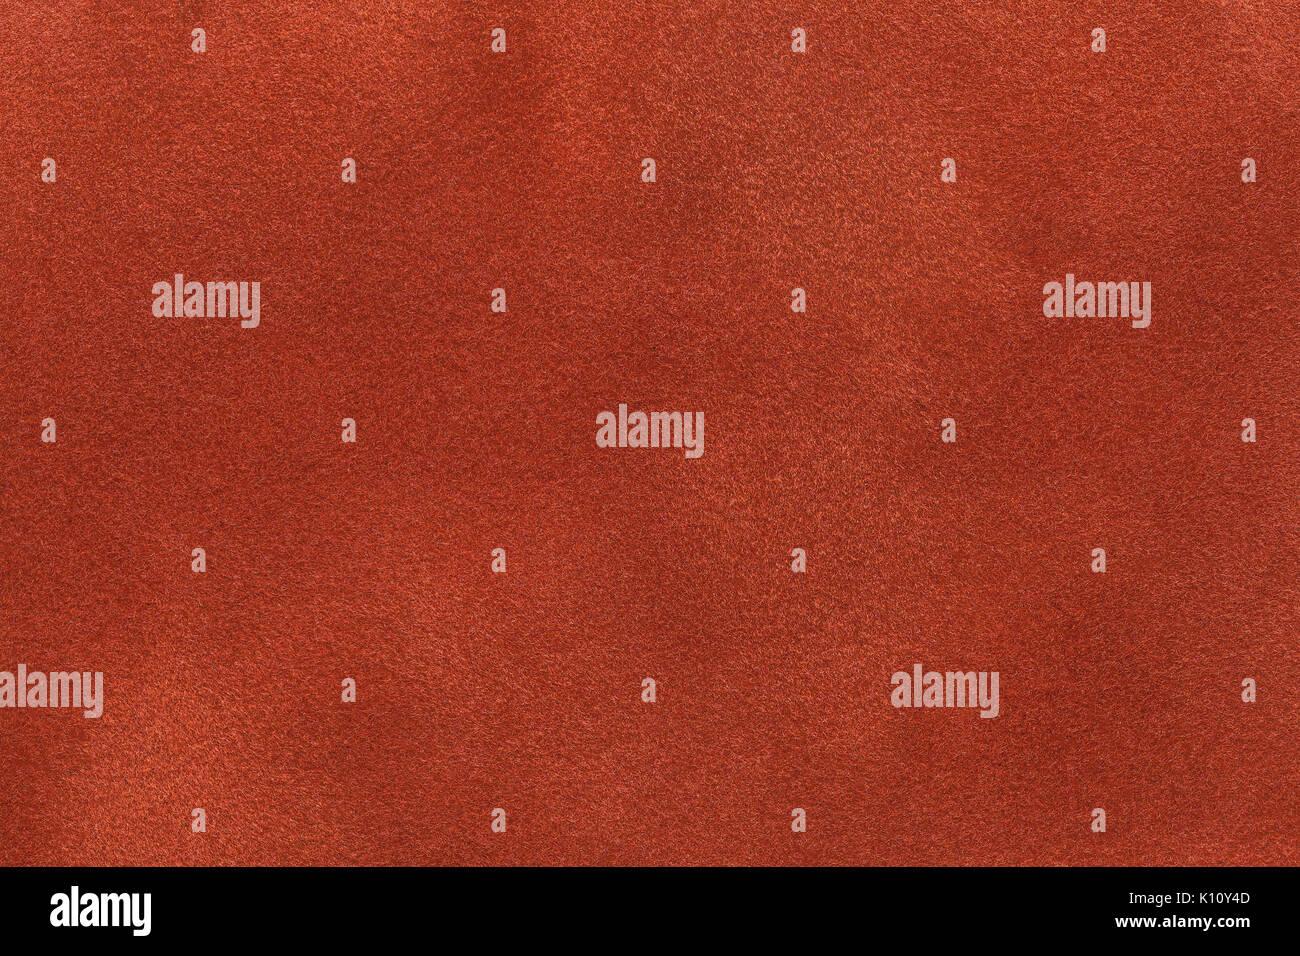 Background Of Dark Orange Suede Fabric Closeup Velvet Matt Texture Ginger Nubuck Textile